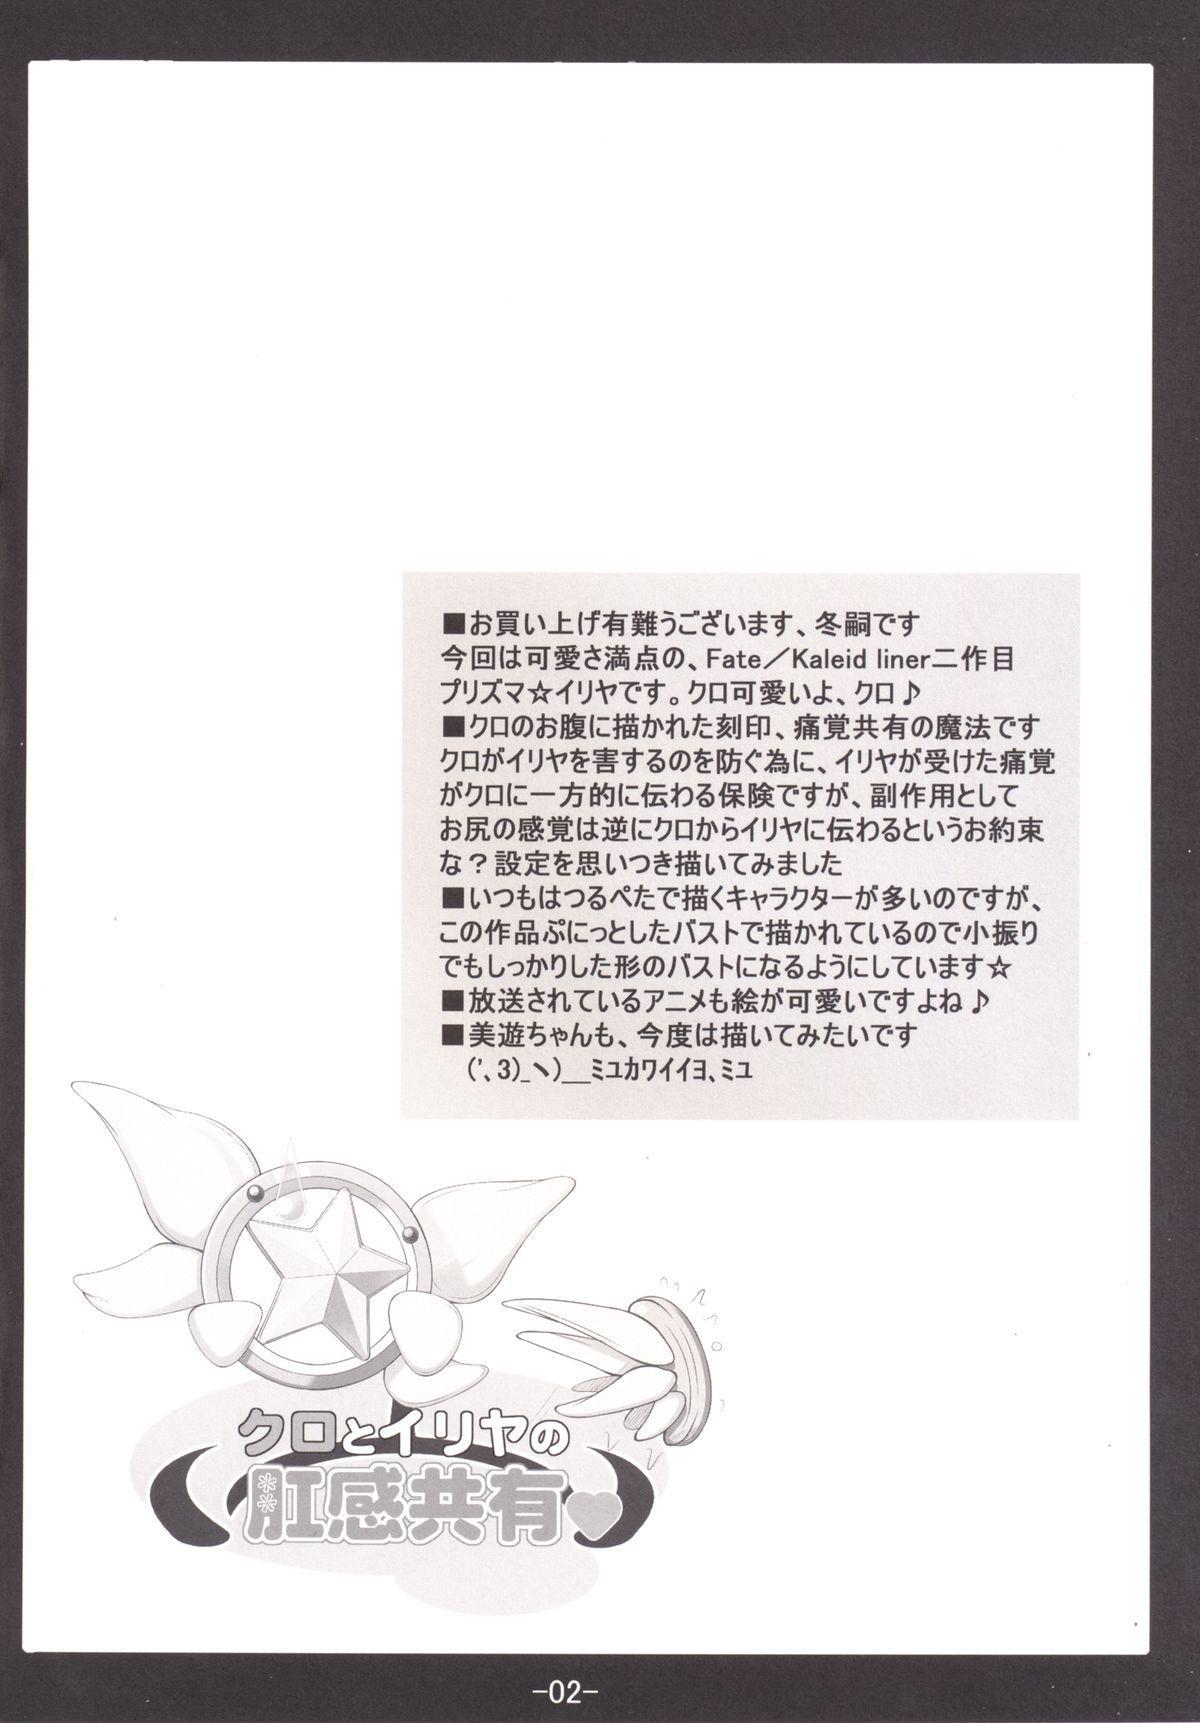 Kuro to Illya no KOUkan Kyouyuu 2